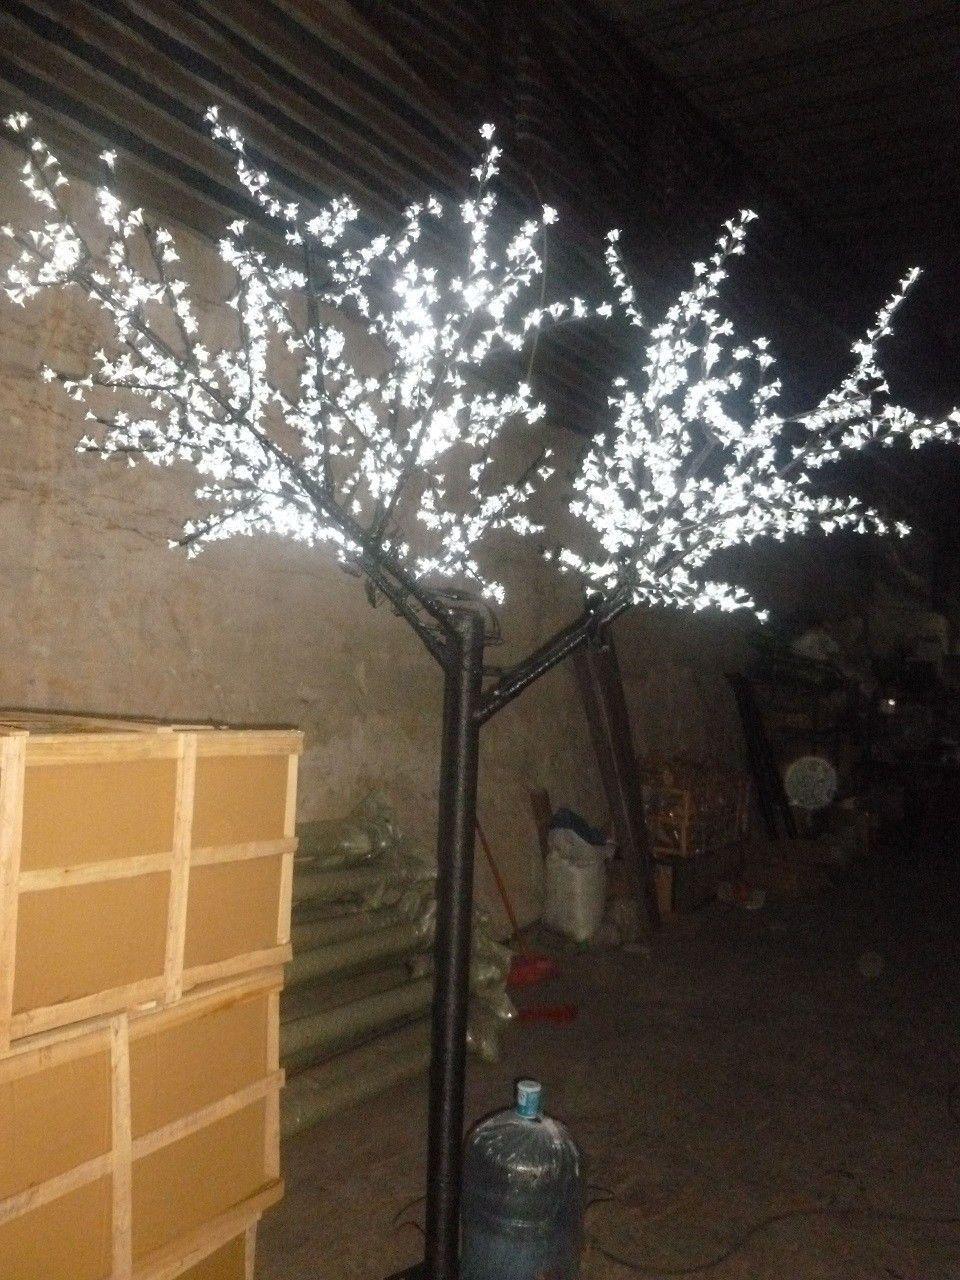 Free Ship 1000 Leds 6 5ft 2m Height Cherry Blossom Tree Light Christmas Party Holiday Wedding Light Tree Ou Holiday Lights Wedding Lights Cherry Blossom Tree